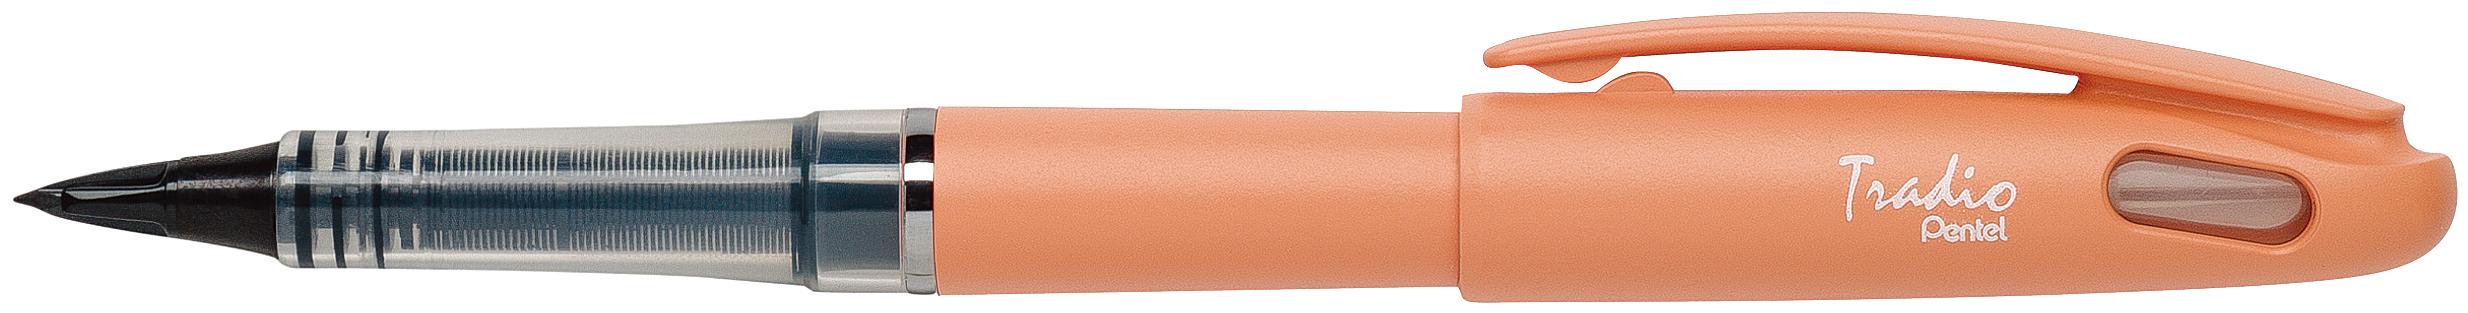 Pentel Tradio Pastel - Feutre plume - corps orange